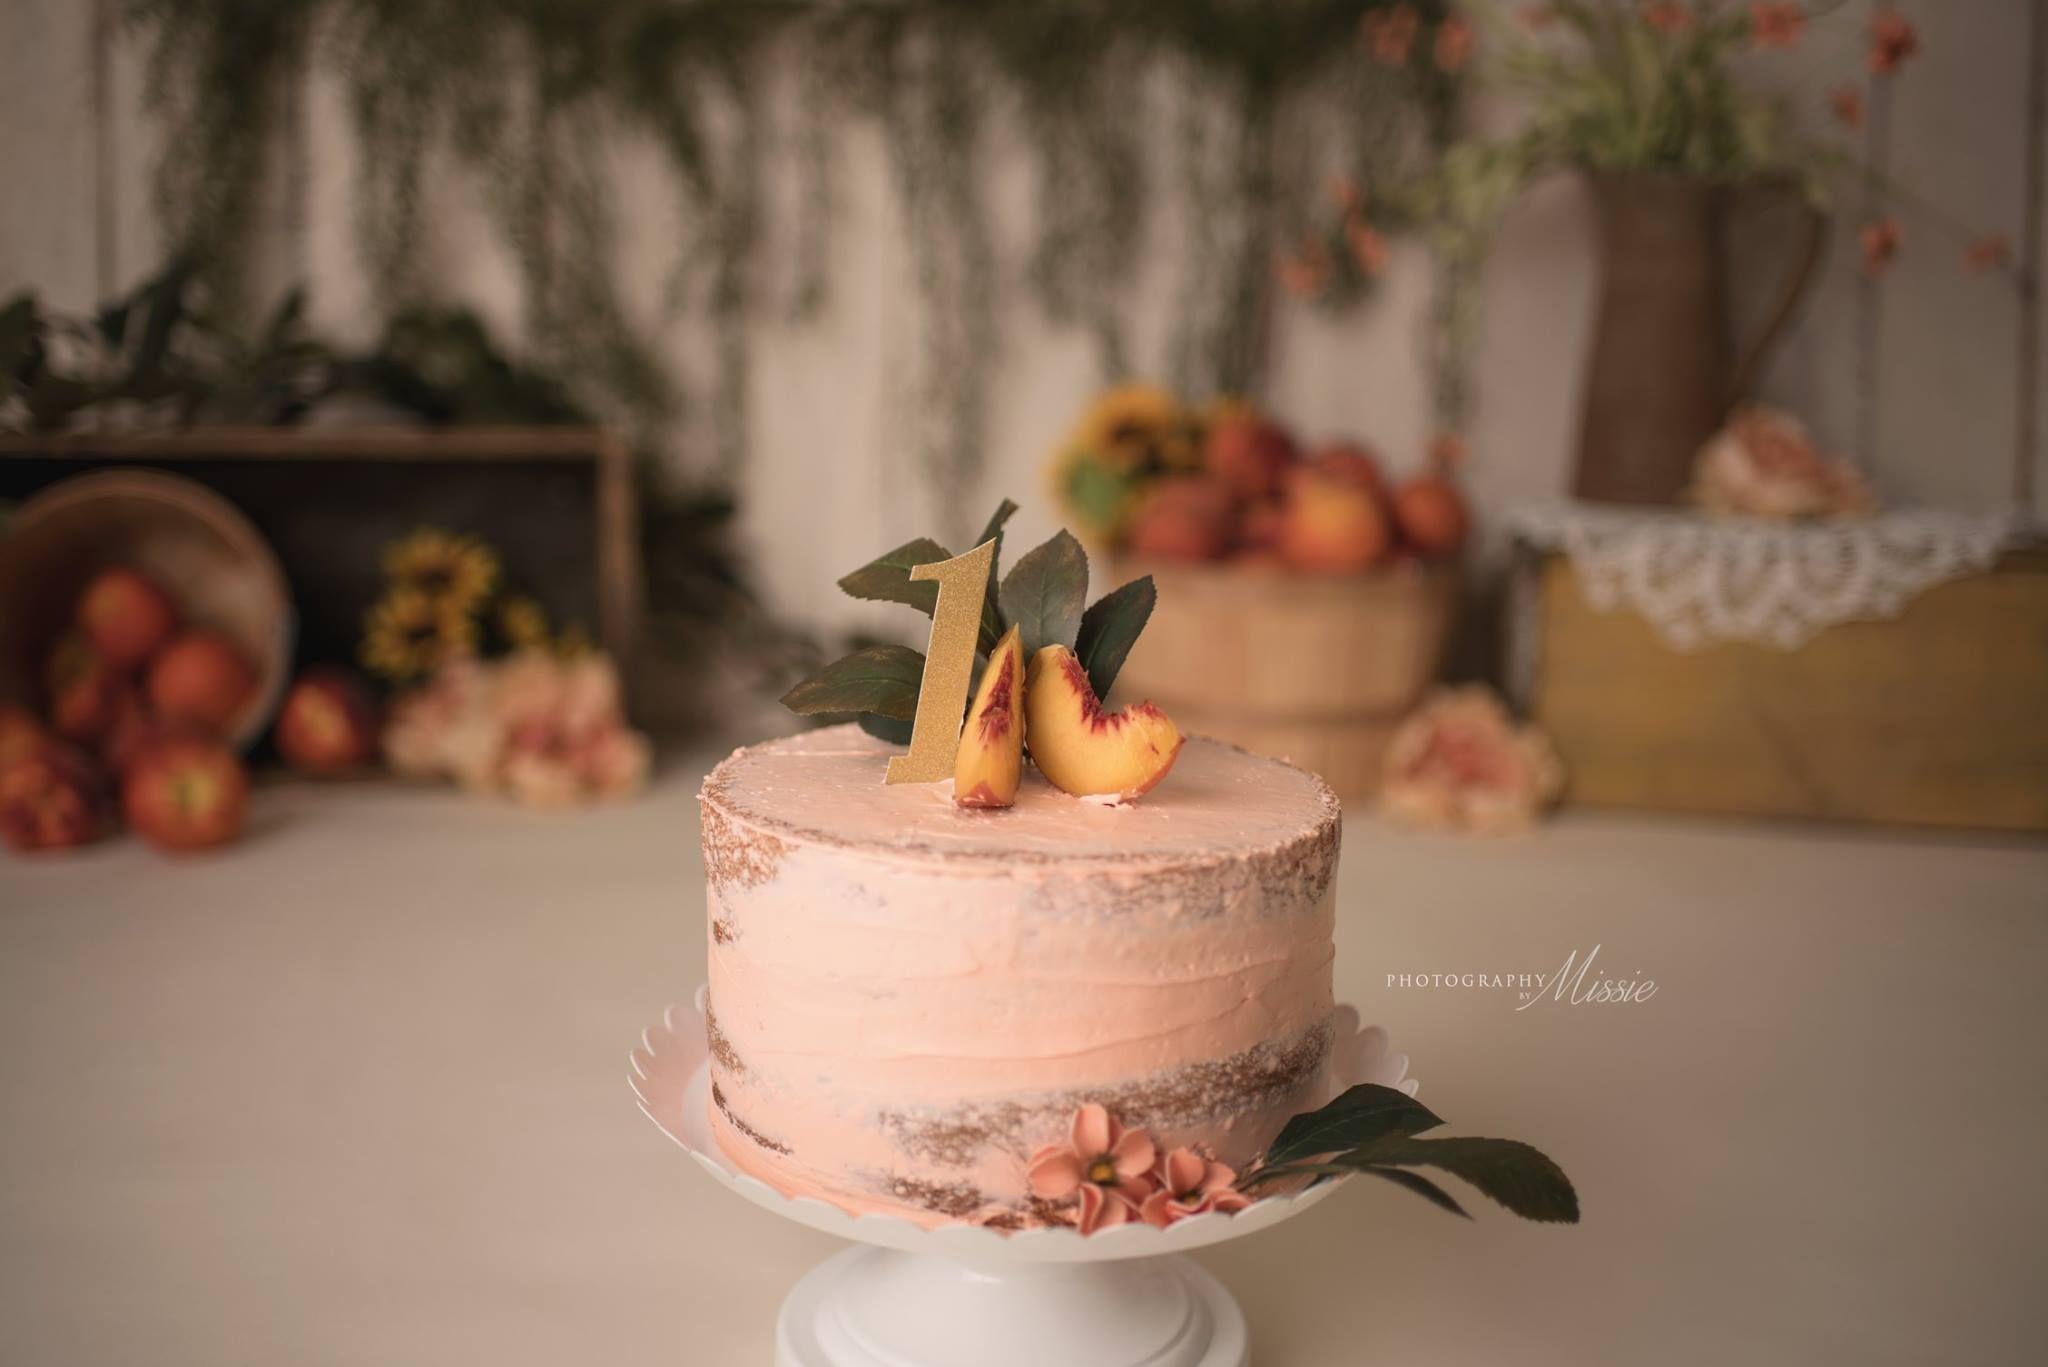 Pin on 40th Birthday Cake Smash Photoshoot